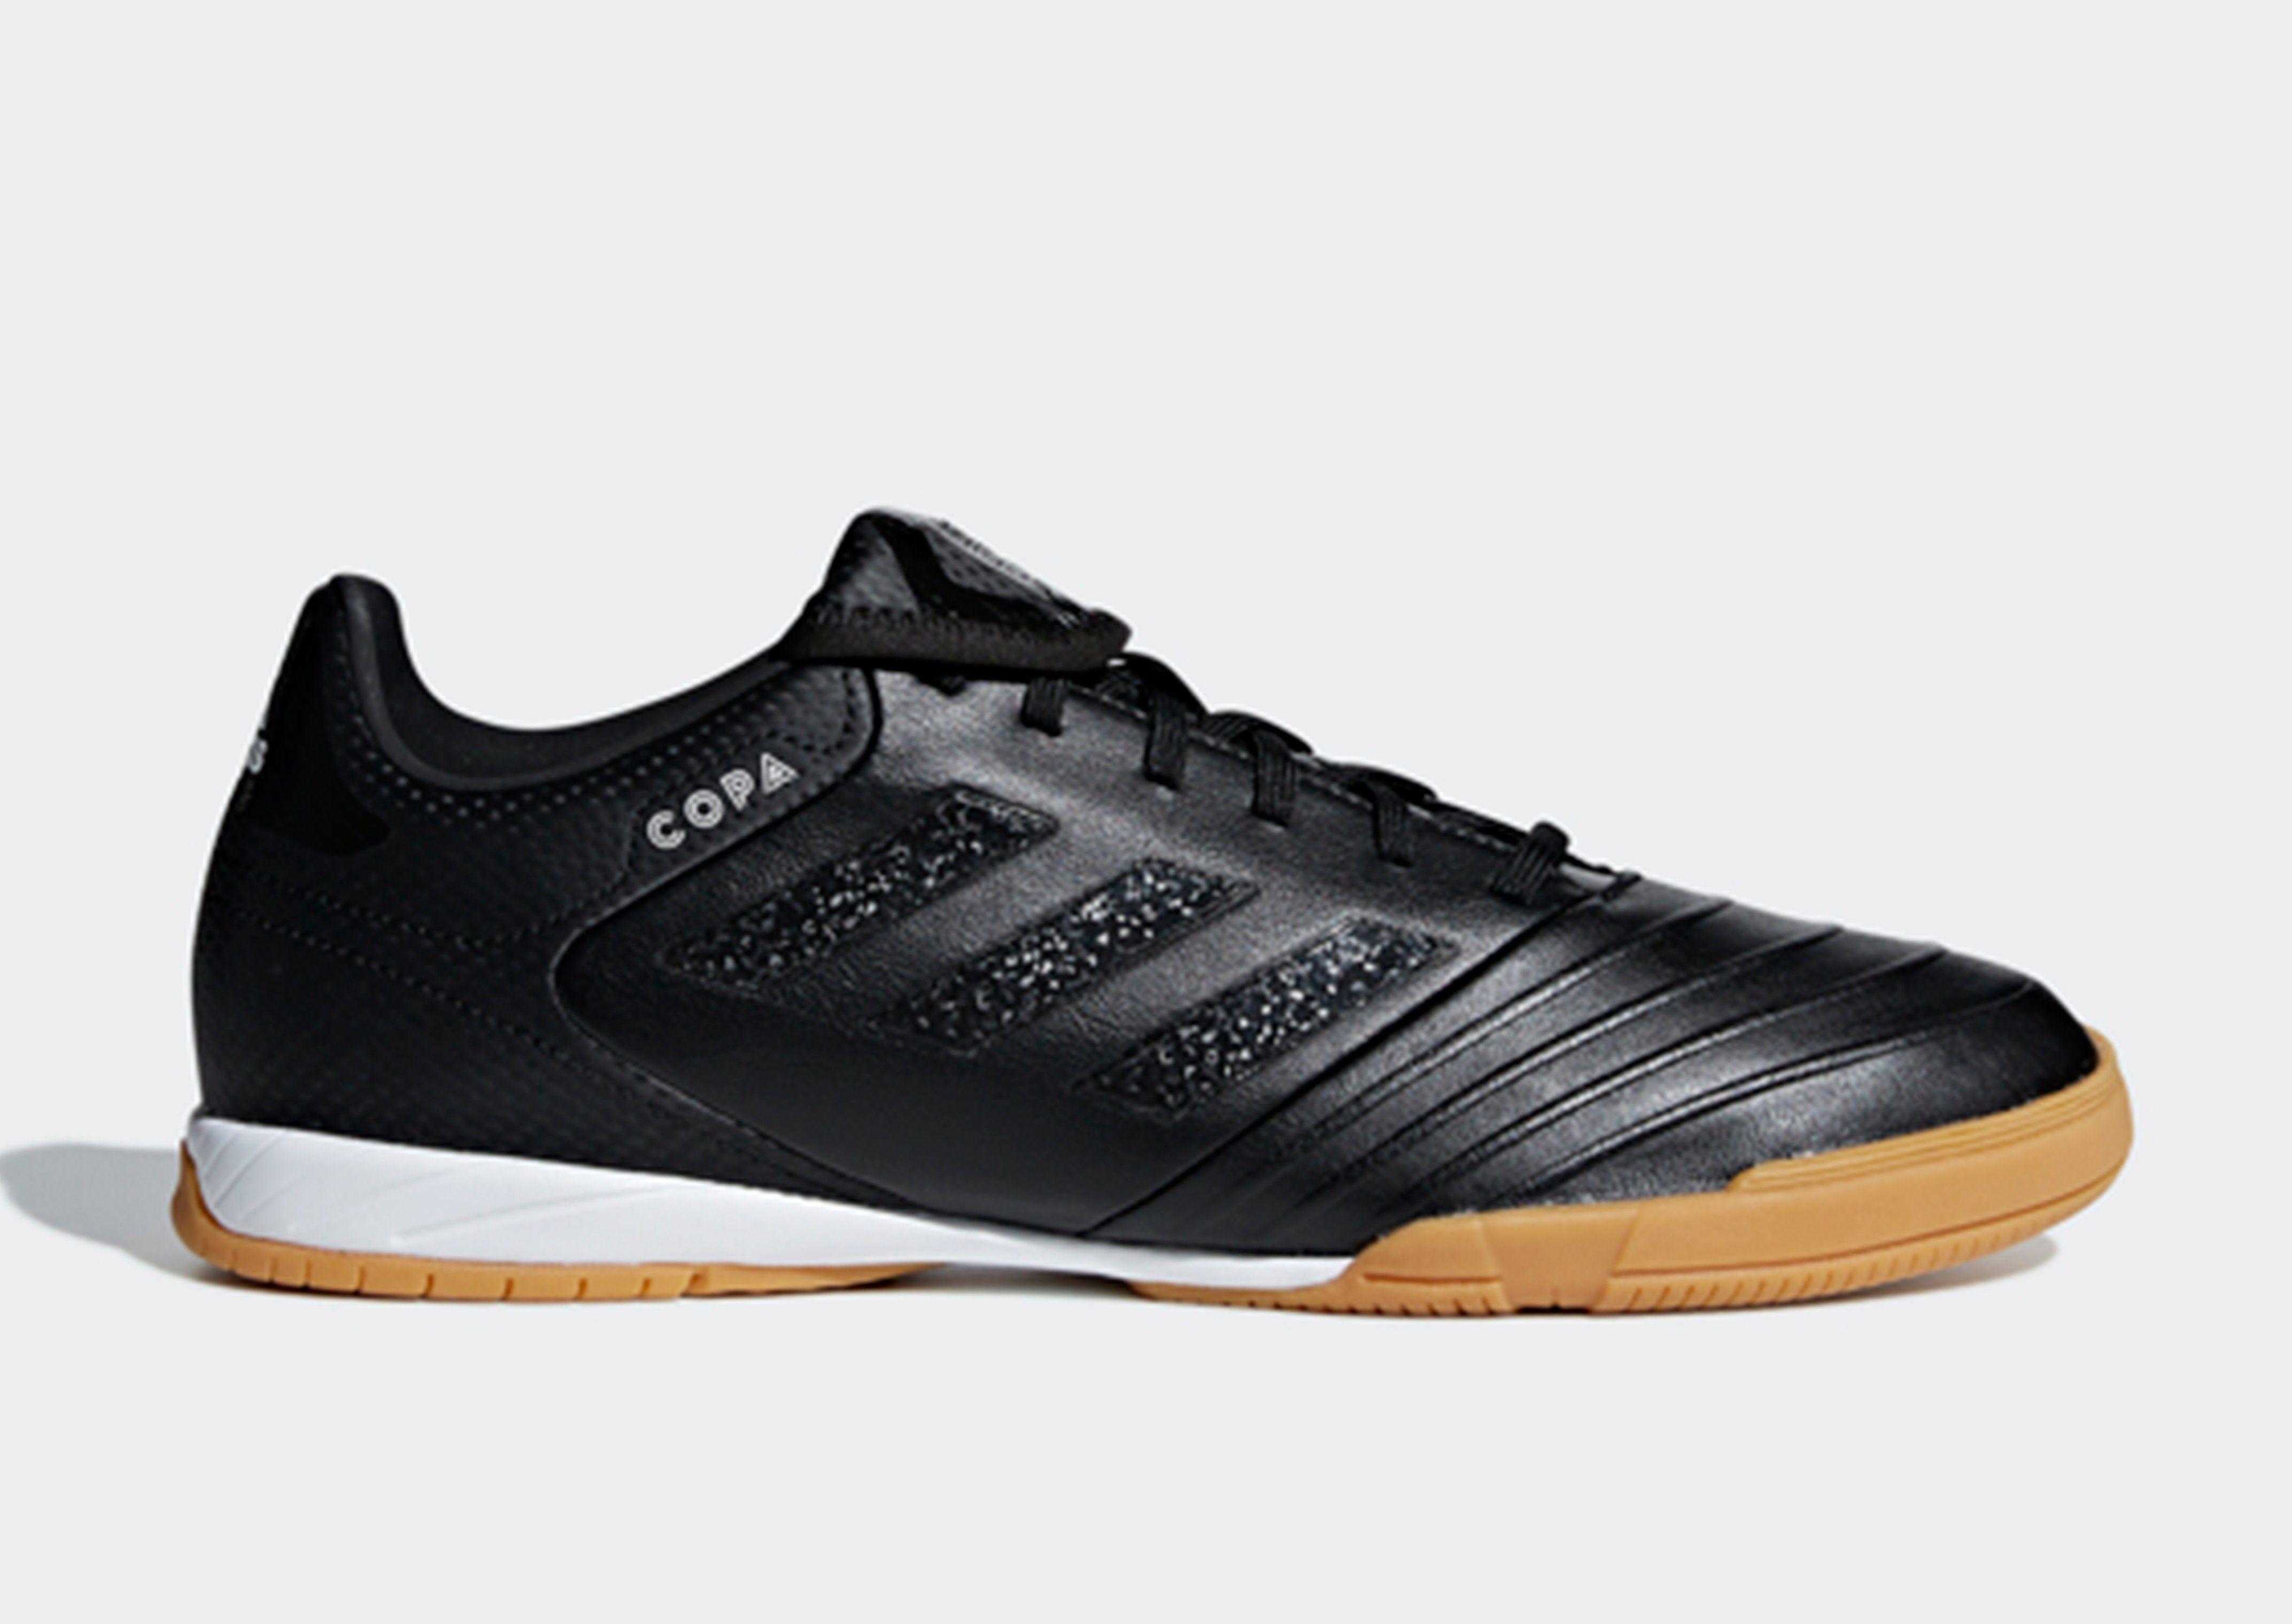 7878f59a688 ADIDAS Copa Tango 18.3 Indoor Boots